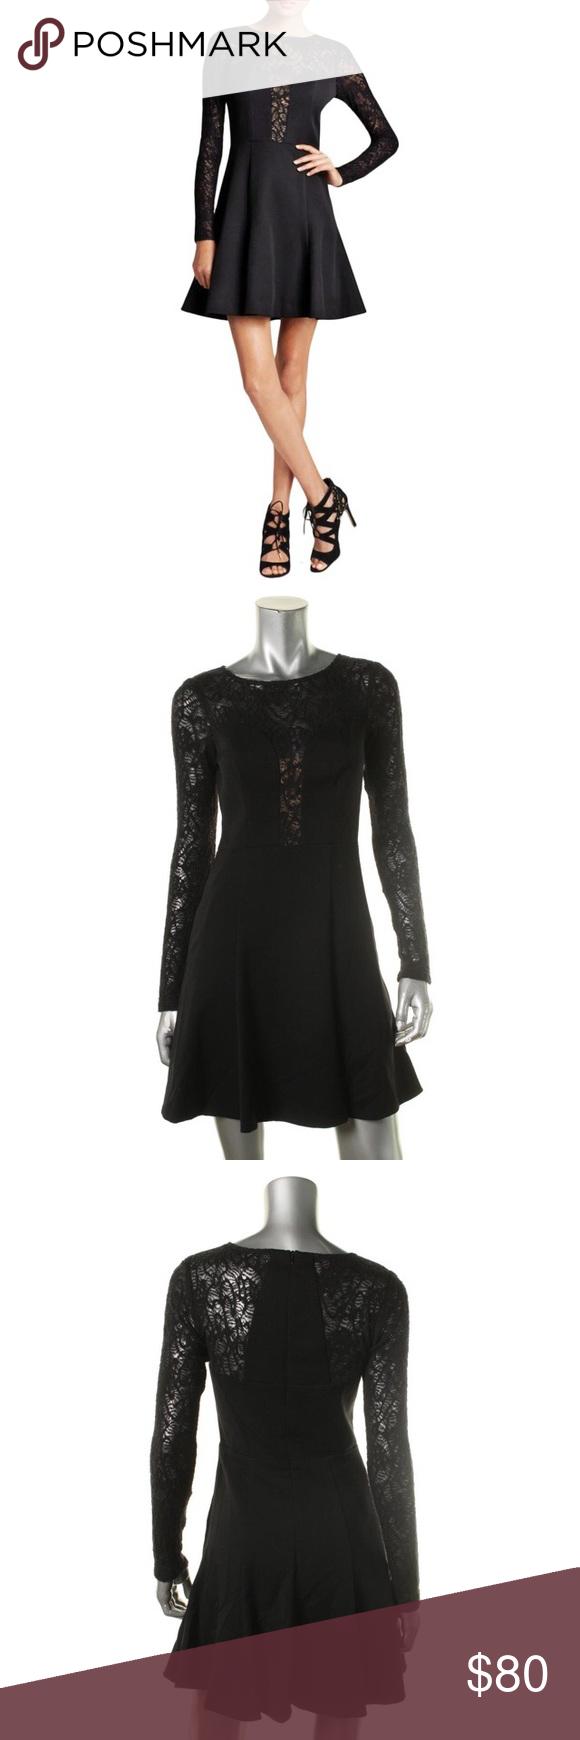 Black halo womenus long sleeve mesh dress nwt long sleeve mesh